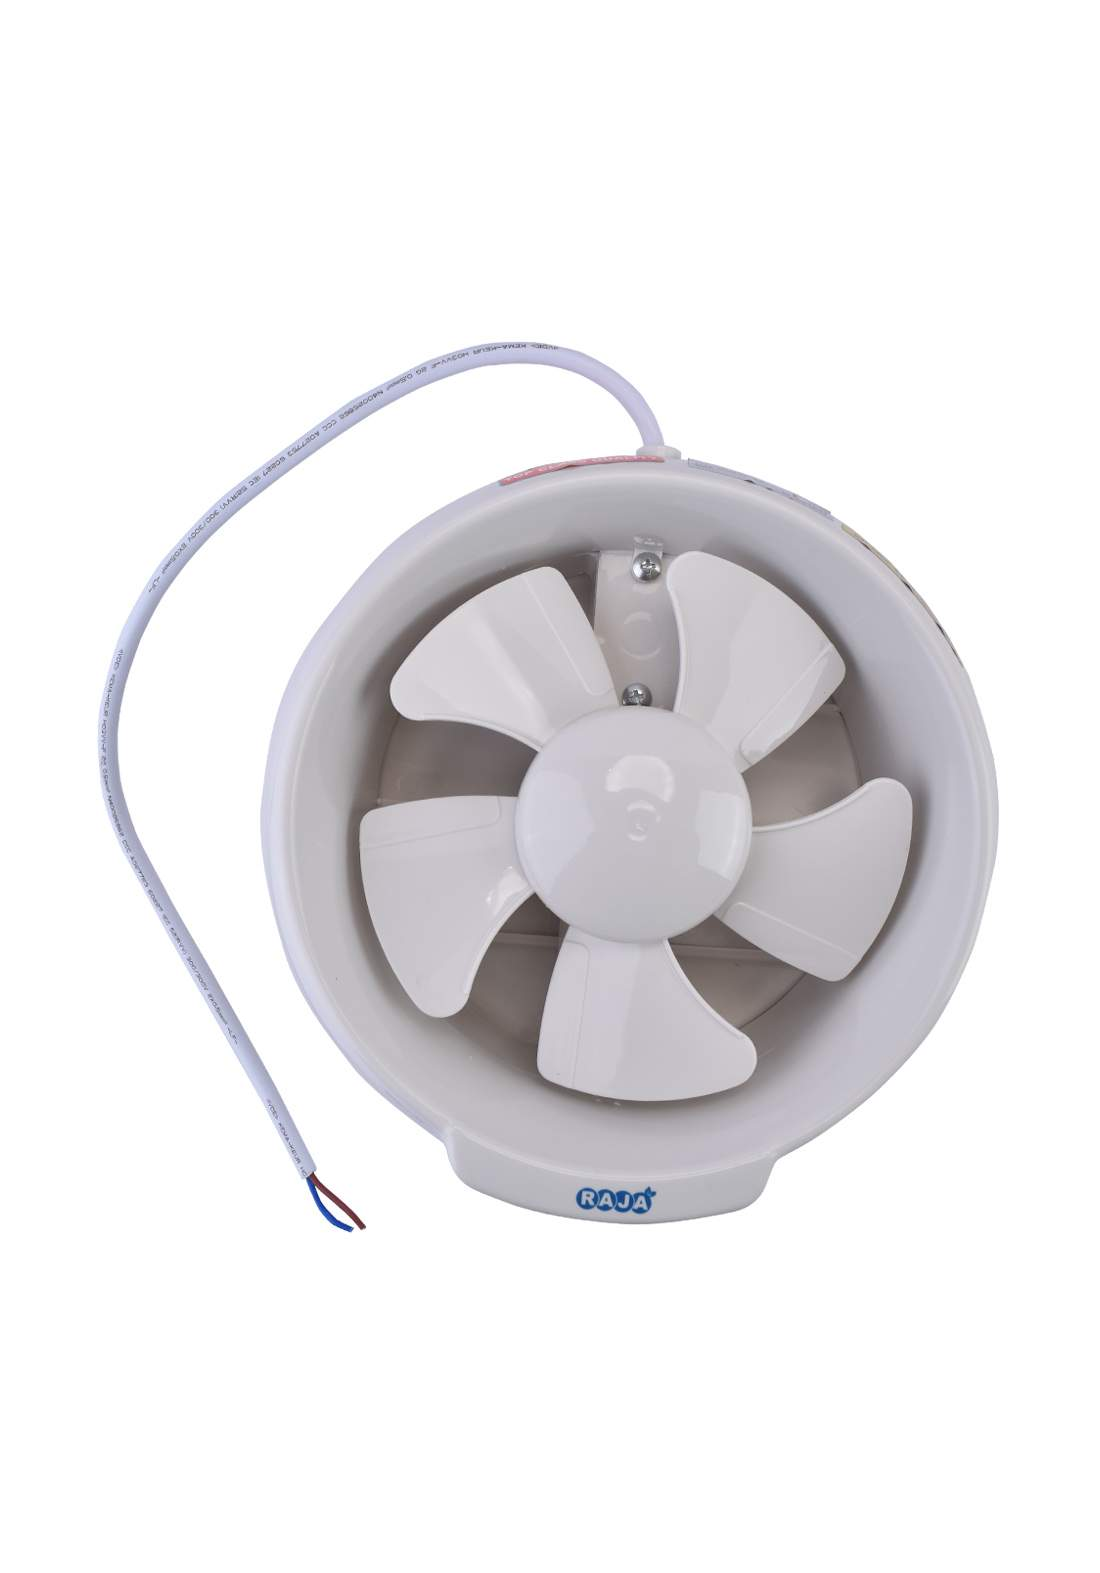 Raja VF-D6GS Ventilating Fans Ultra Breeze 15 cm مفرغة هواء